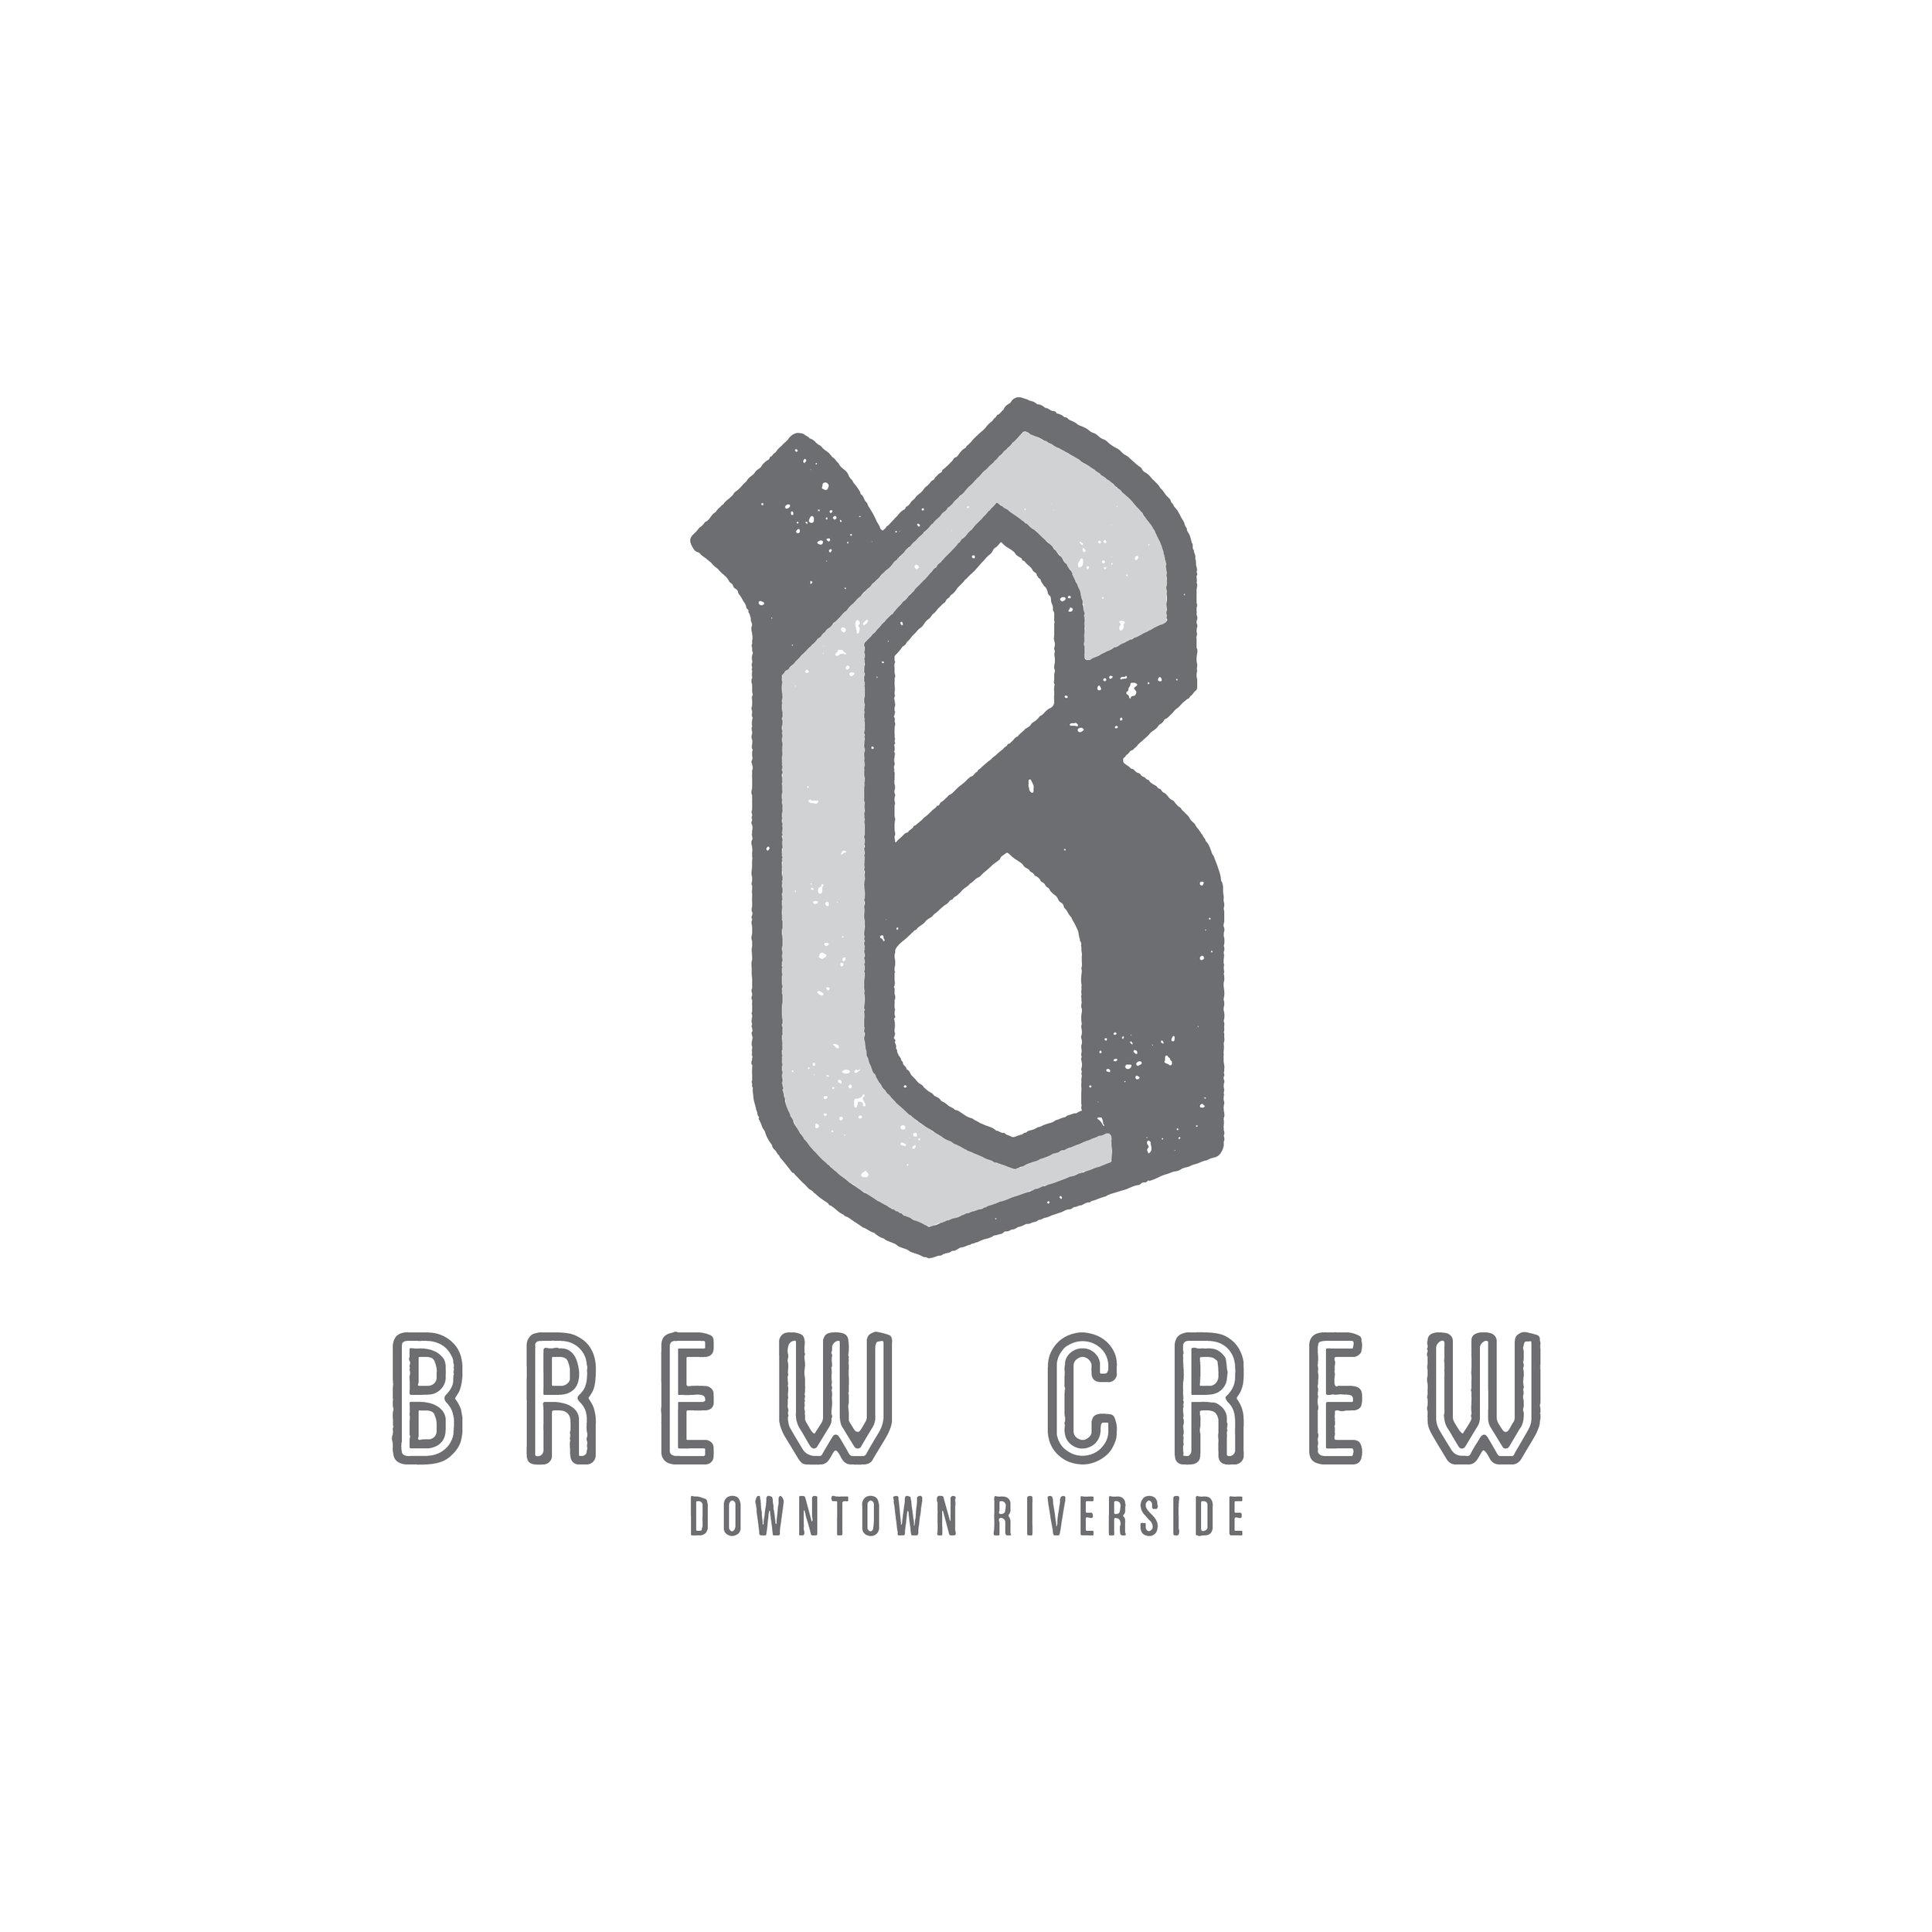 BrewCrew-01.jpg